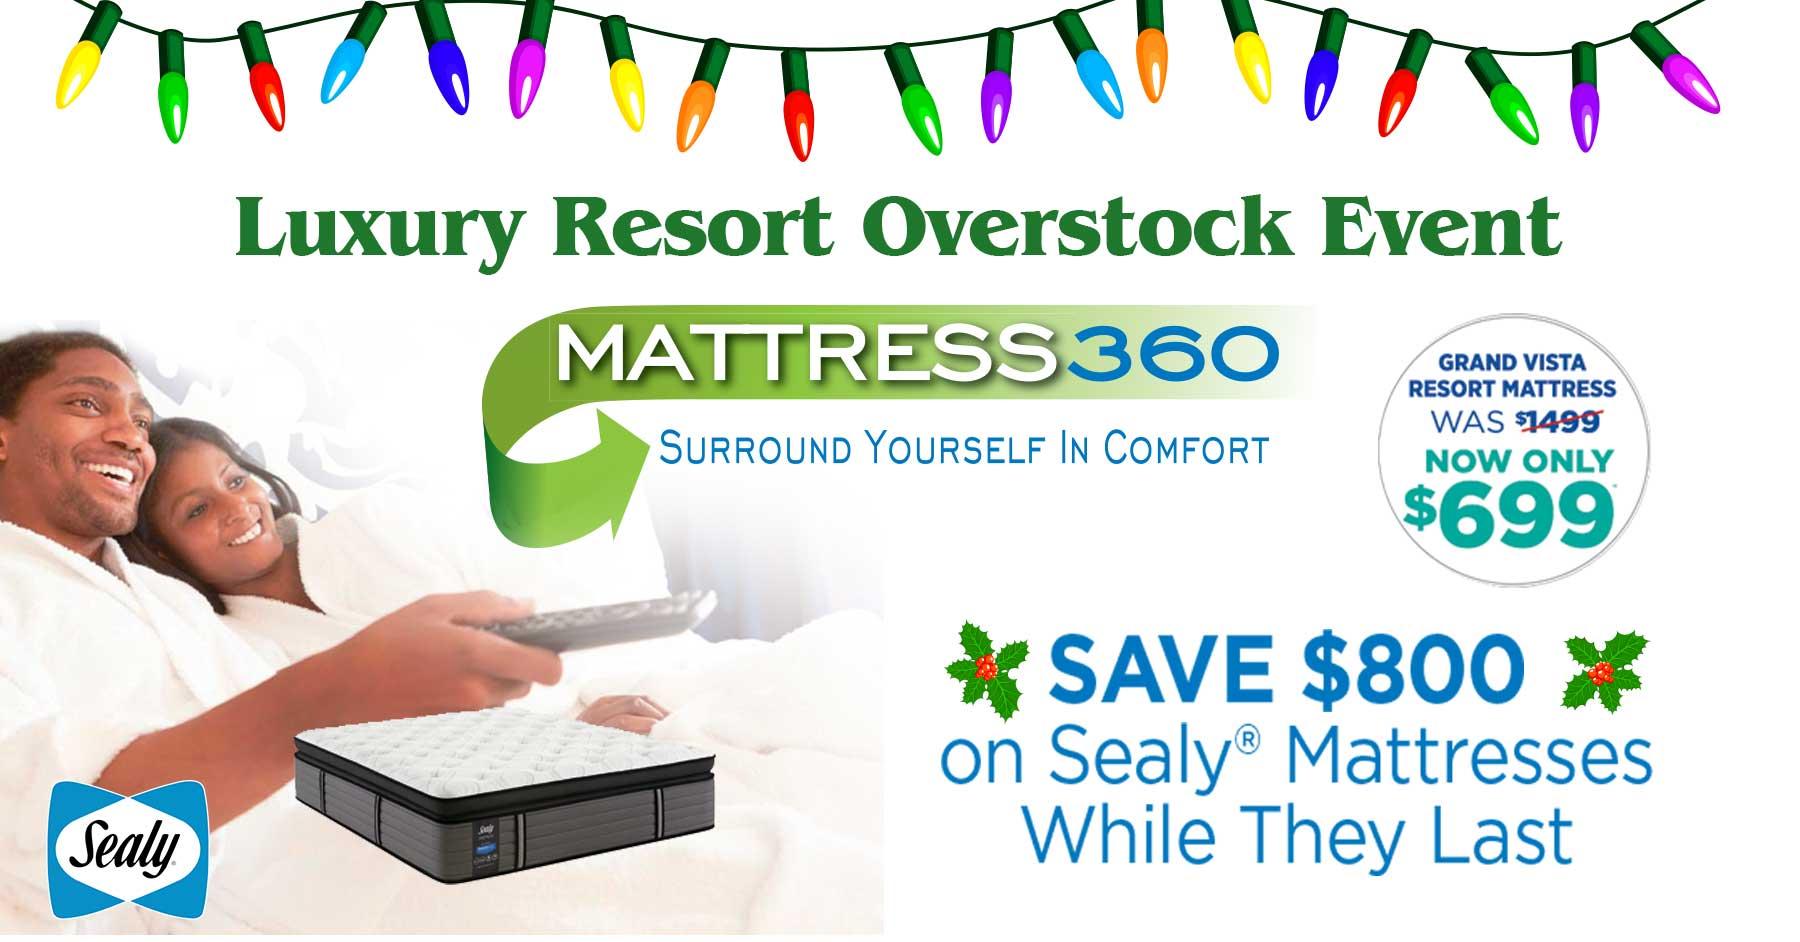 Mattress-360-1800x942